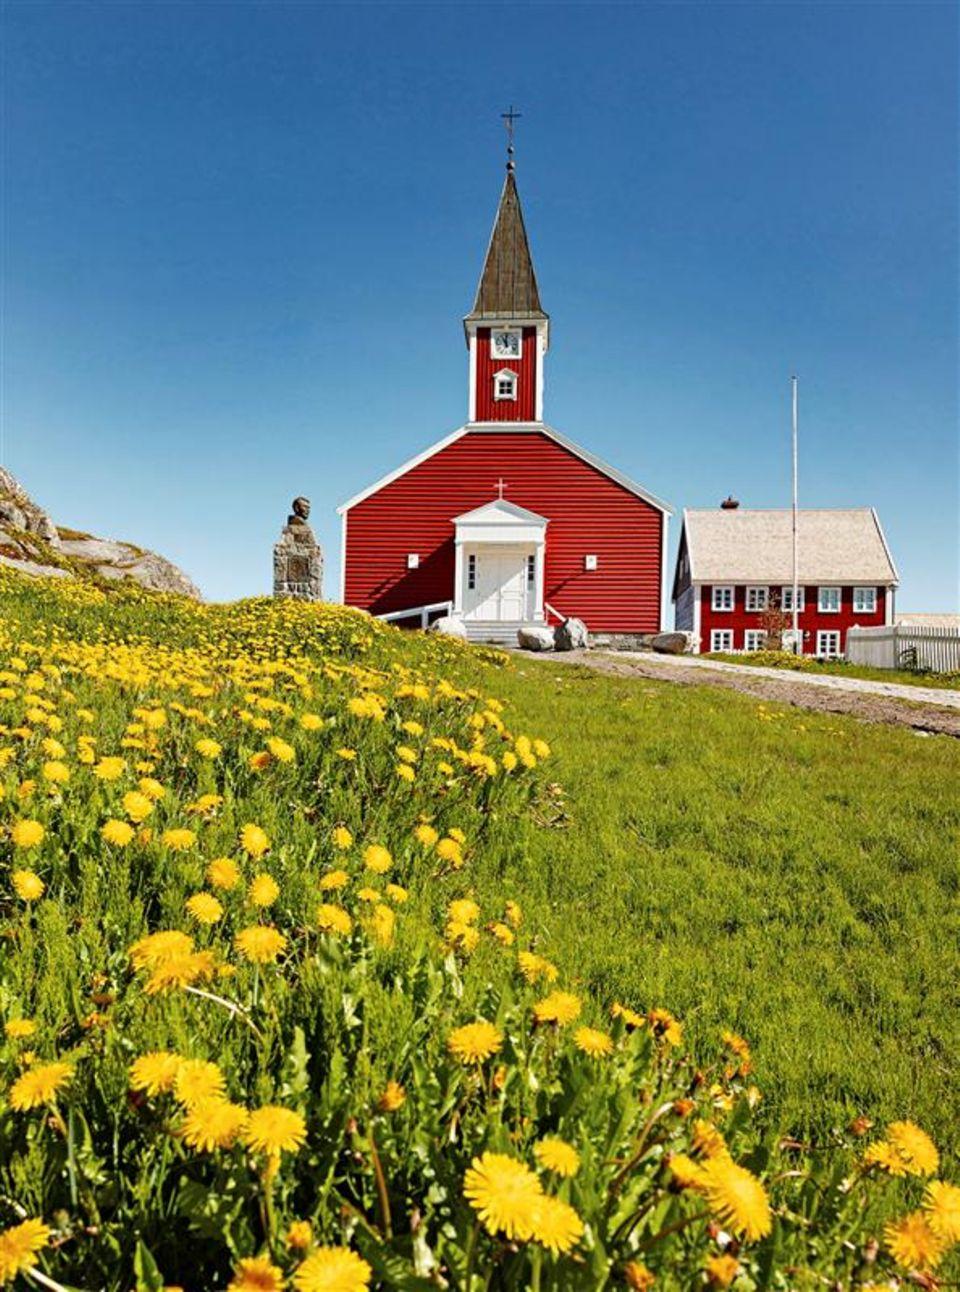 Grönland: Rote Kirche